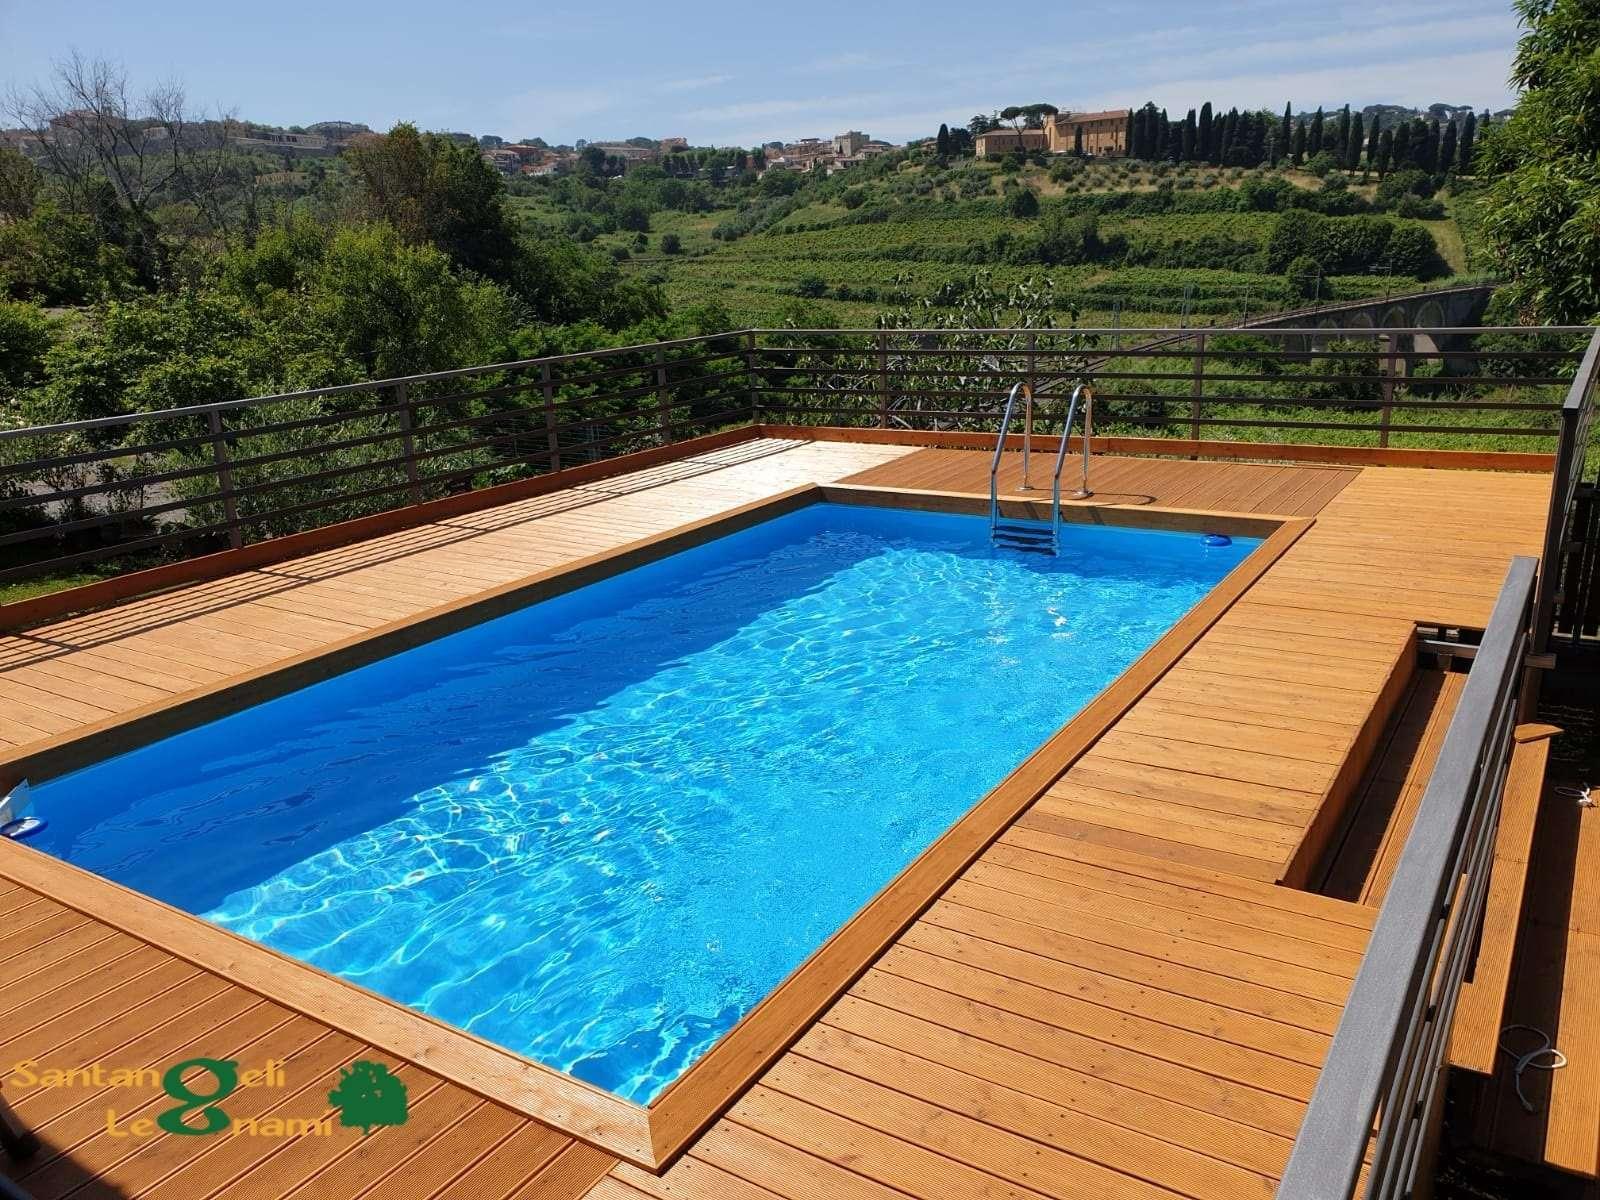 larice pavimento bordo pisicna - legnami per piscina roma